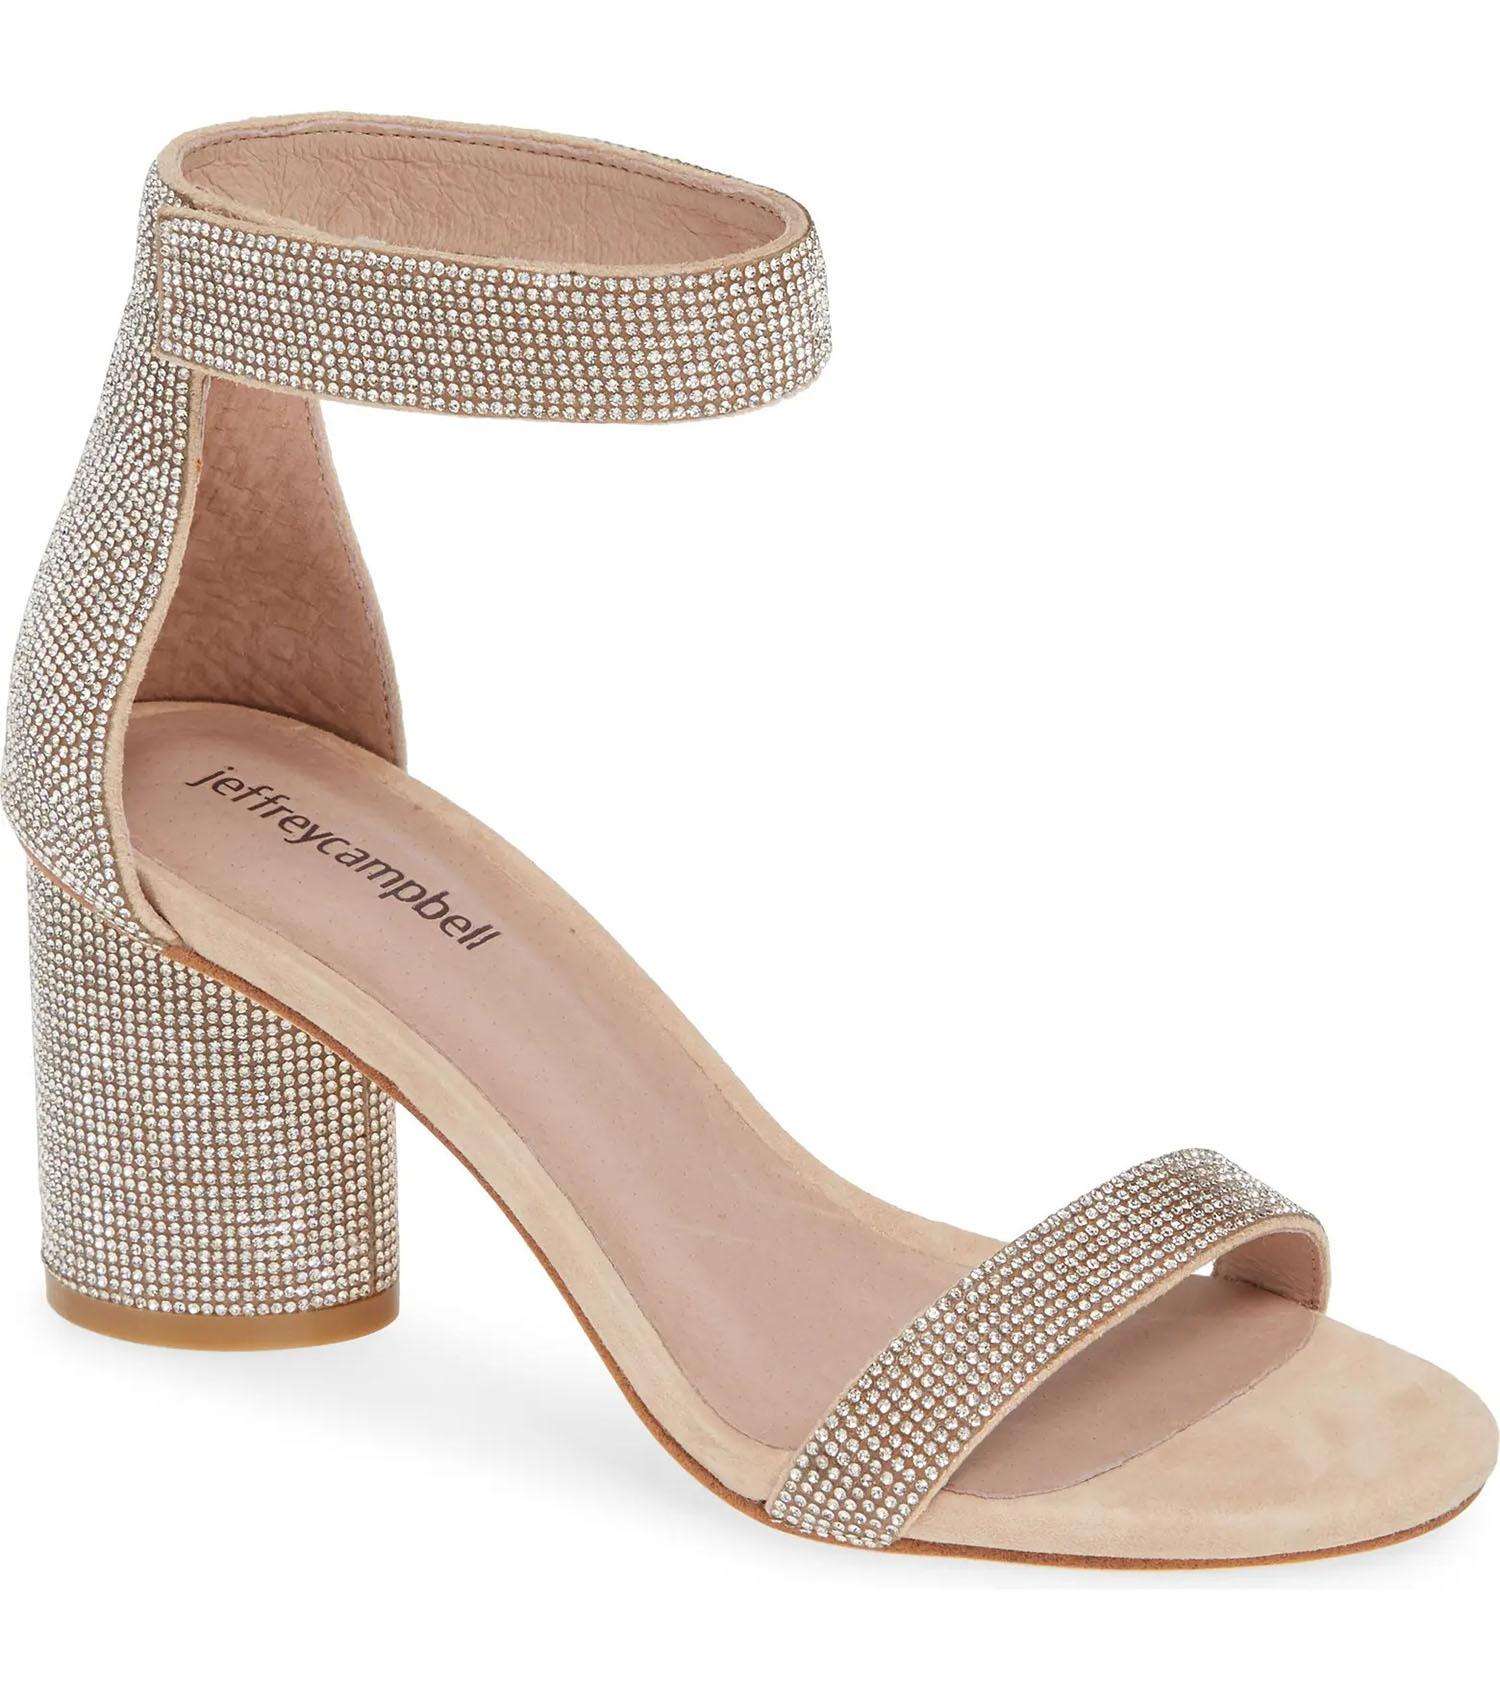 crystal embellished Jeffrey Campbell chunky neutral tone Nordstrom Rack heel wedding shoes